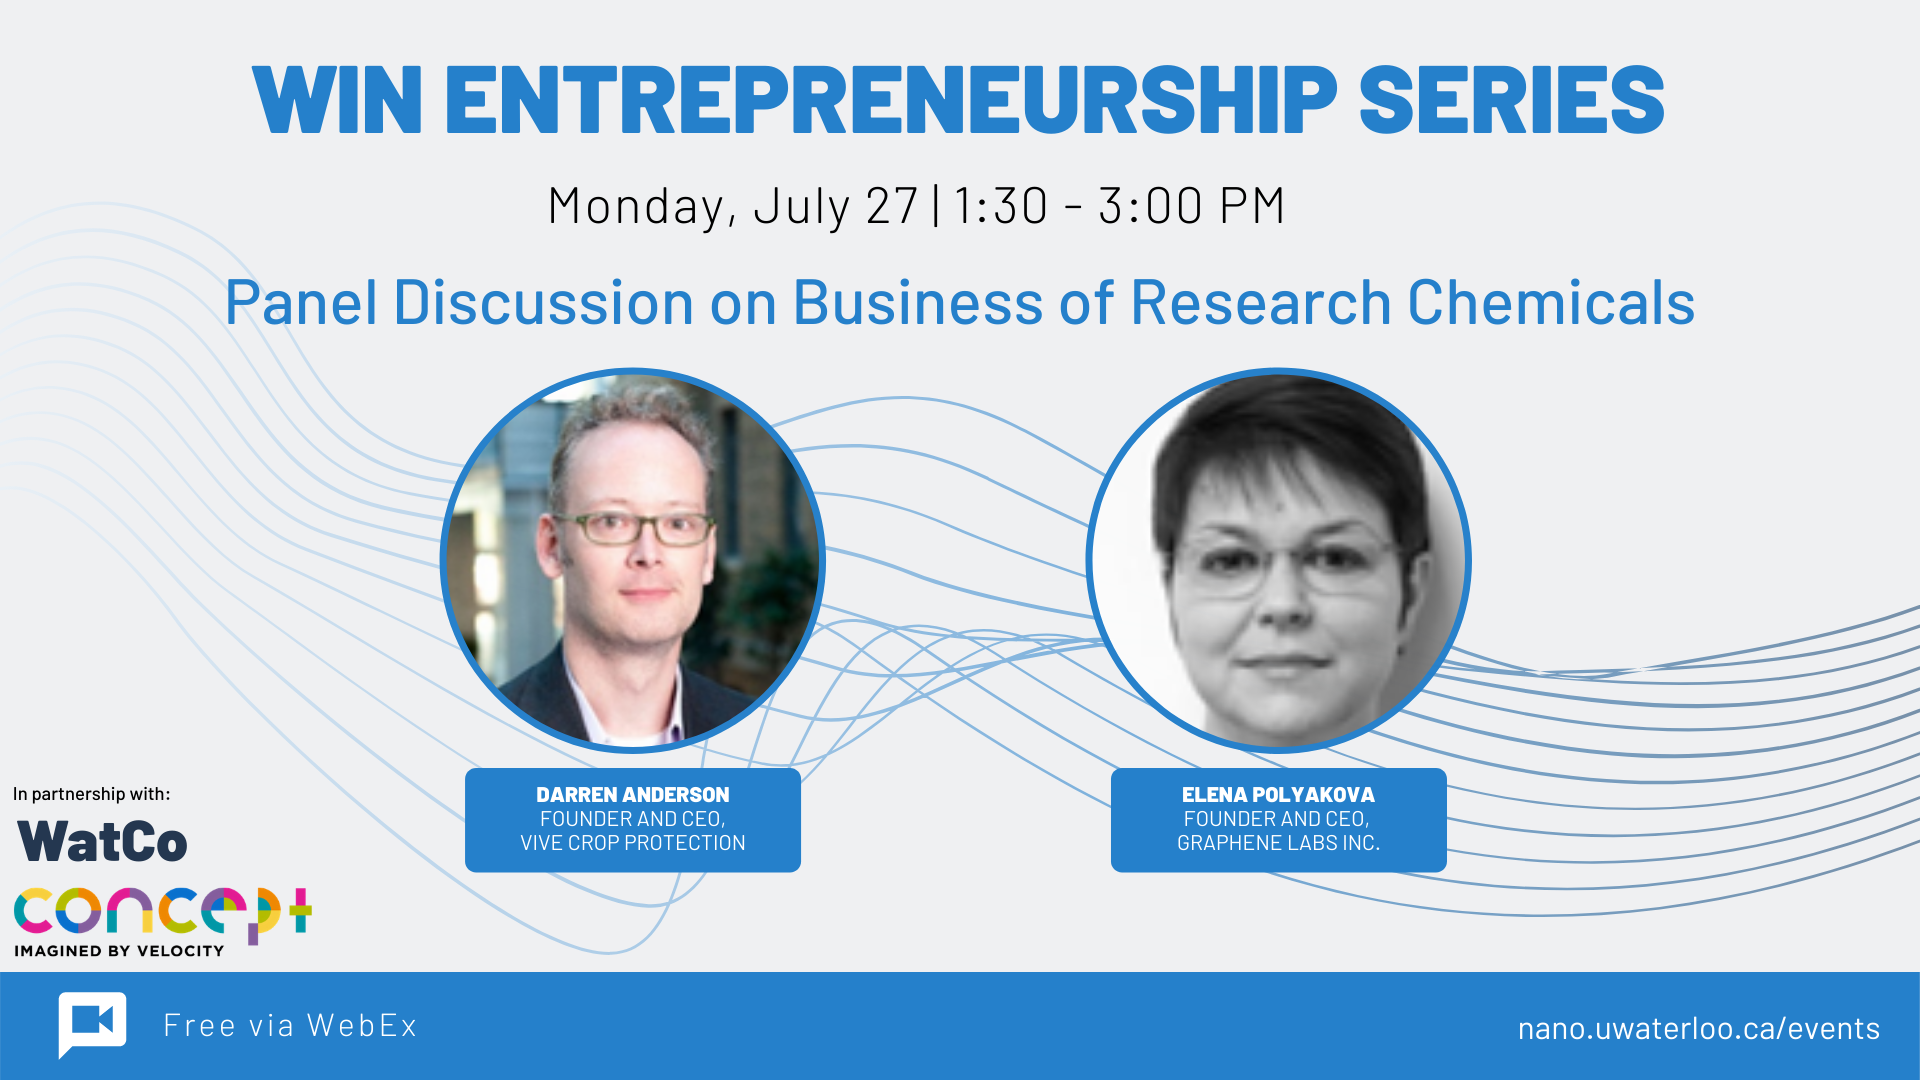 Nano entrepreneurship series